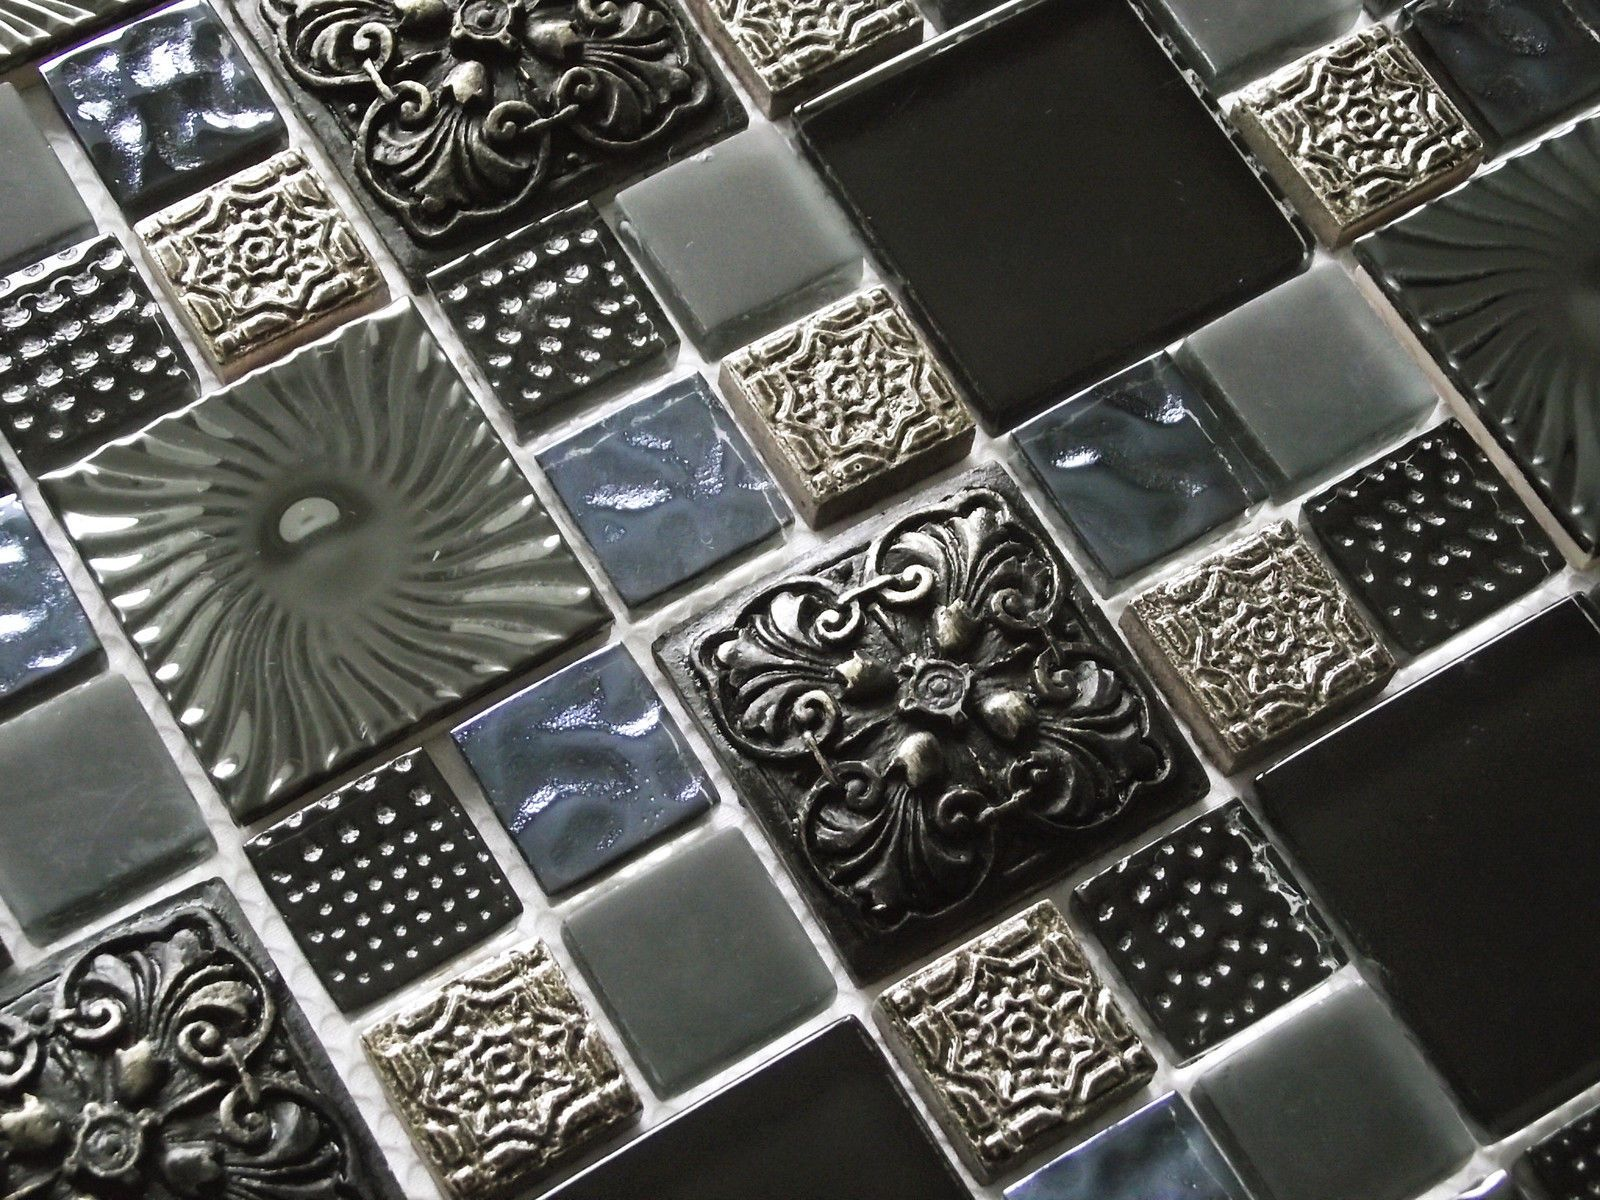 Metal mosaic tile mirror kitchen backsplash metal crystal glass stone - New Ancient Luxury High Relief Glass Stone Metal Mosaic Tiles 8mm Rrp 25